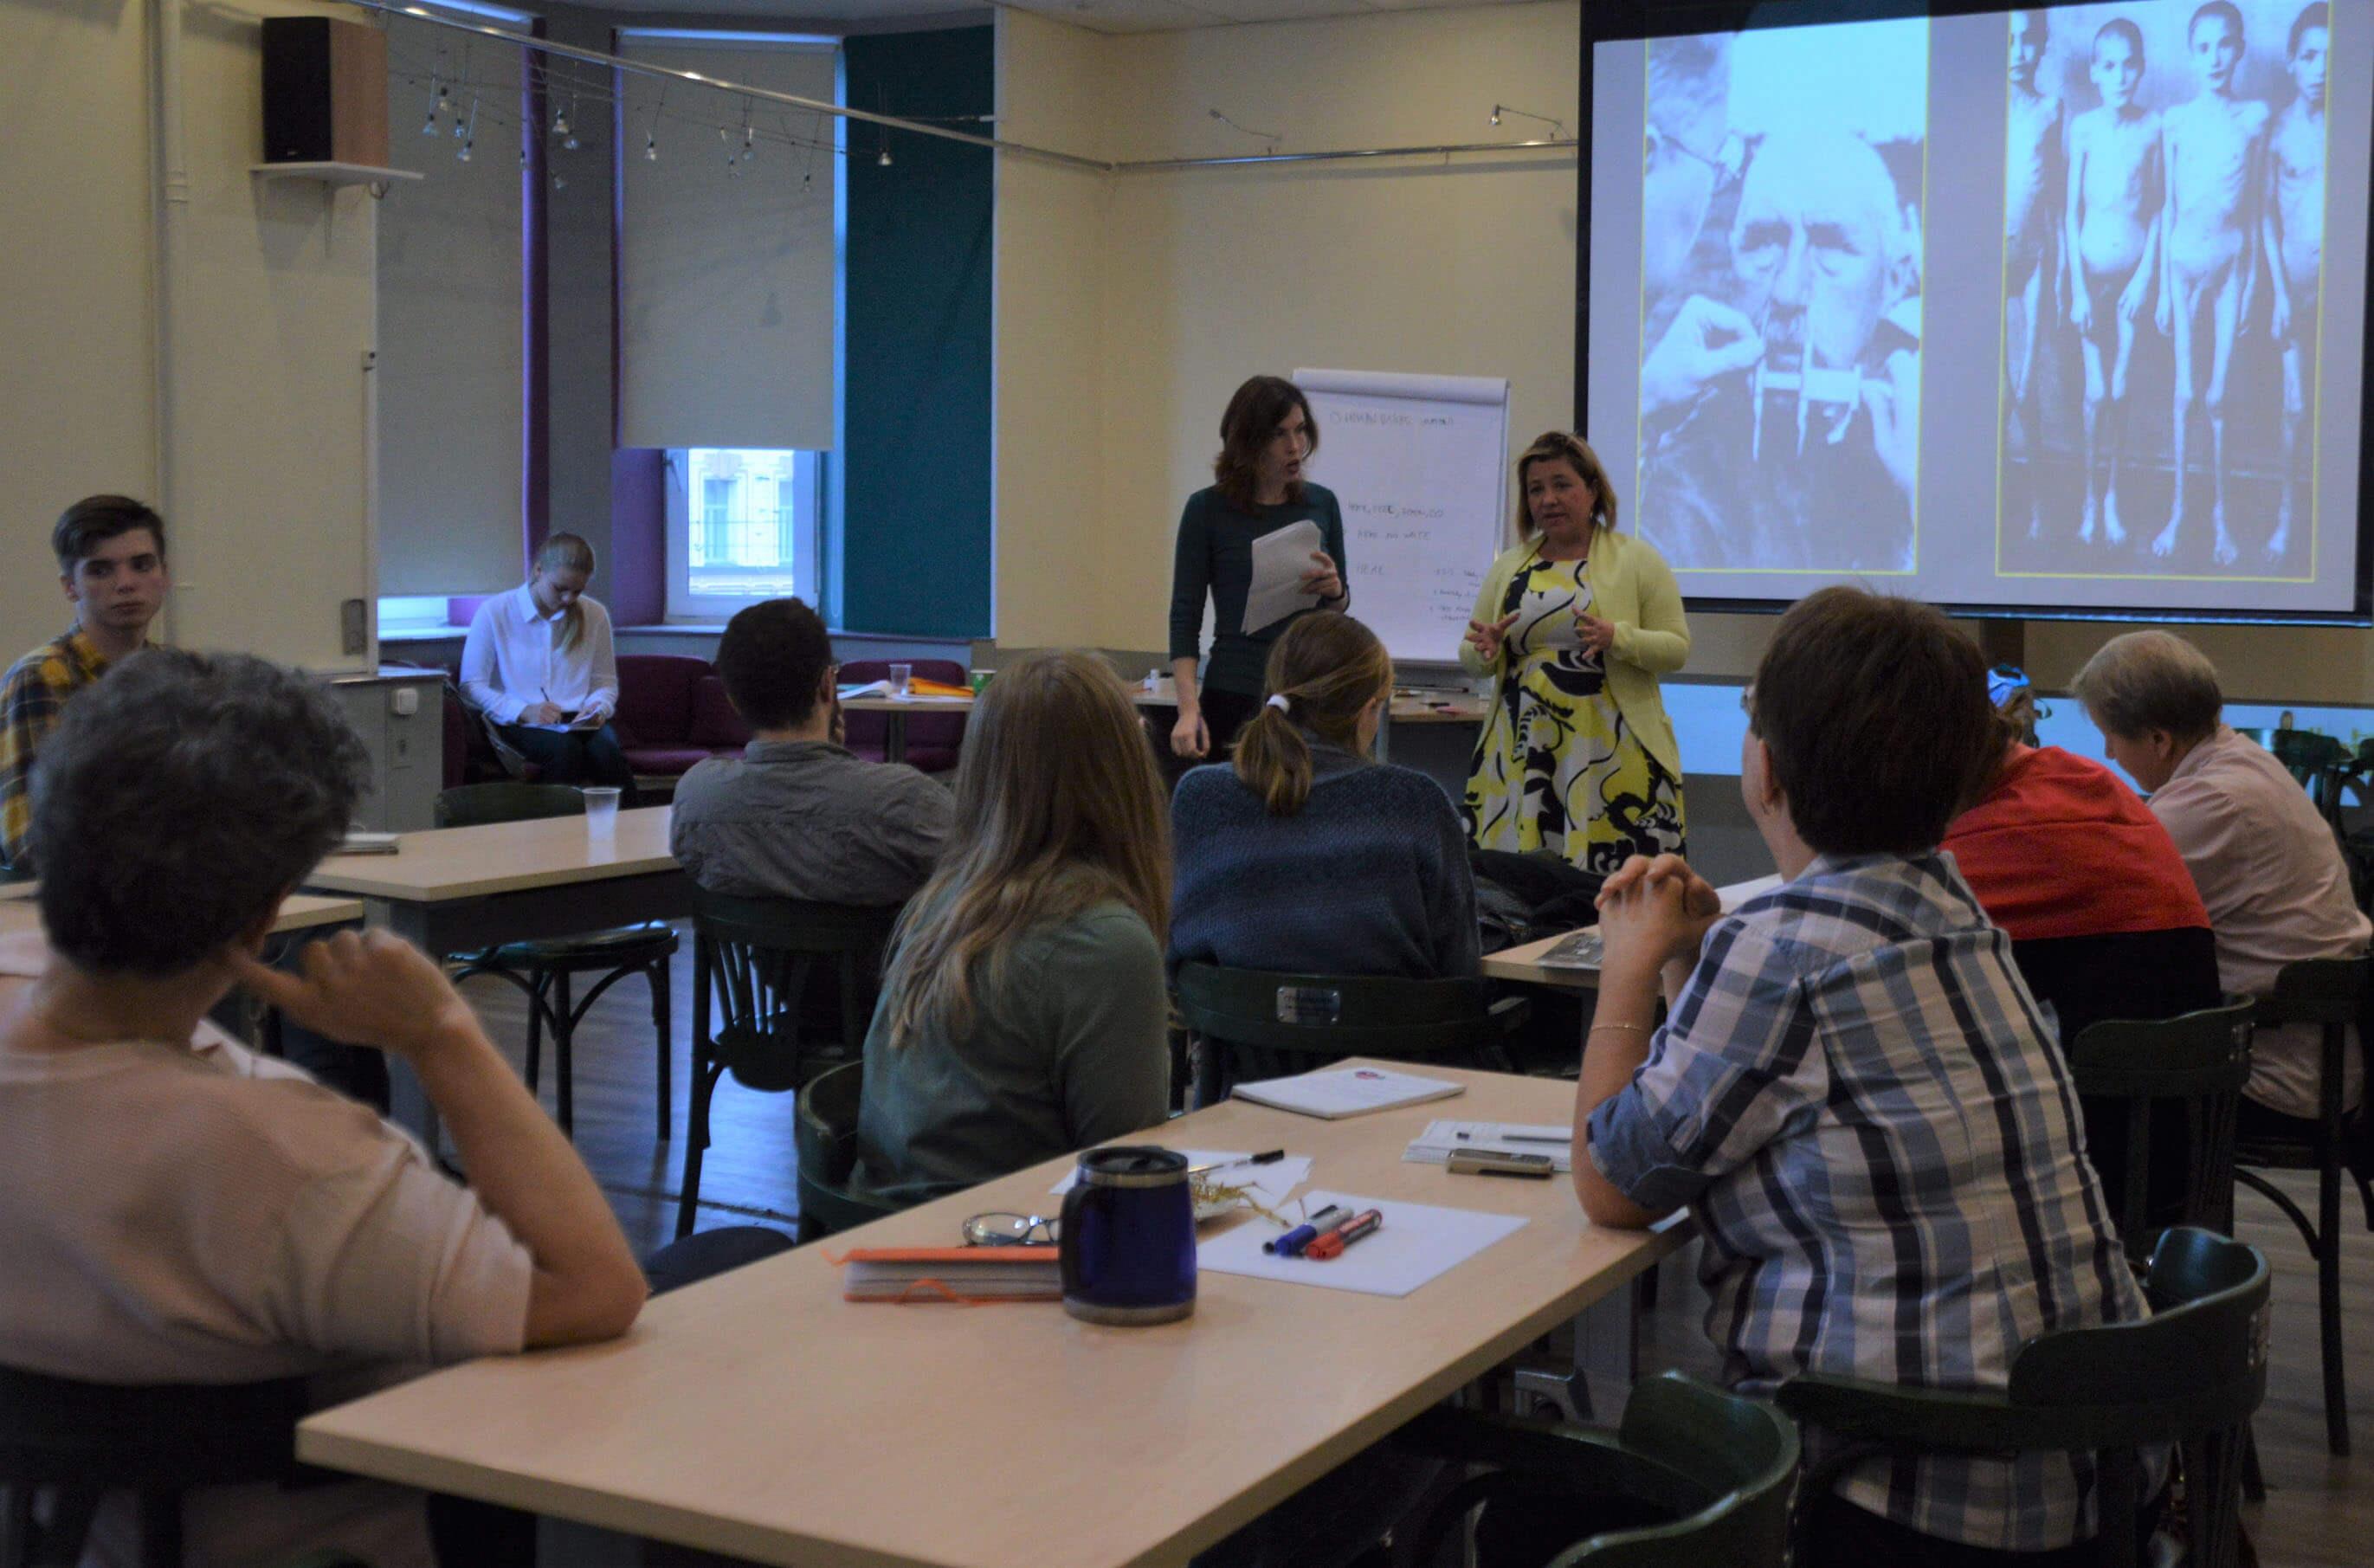 Hanna and Goliath fortbildar lärare i Ryssland